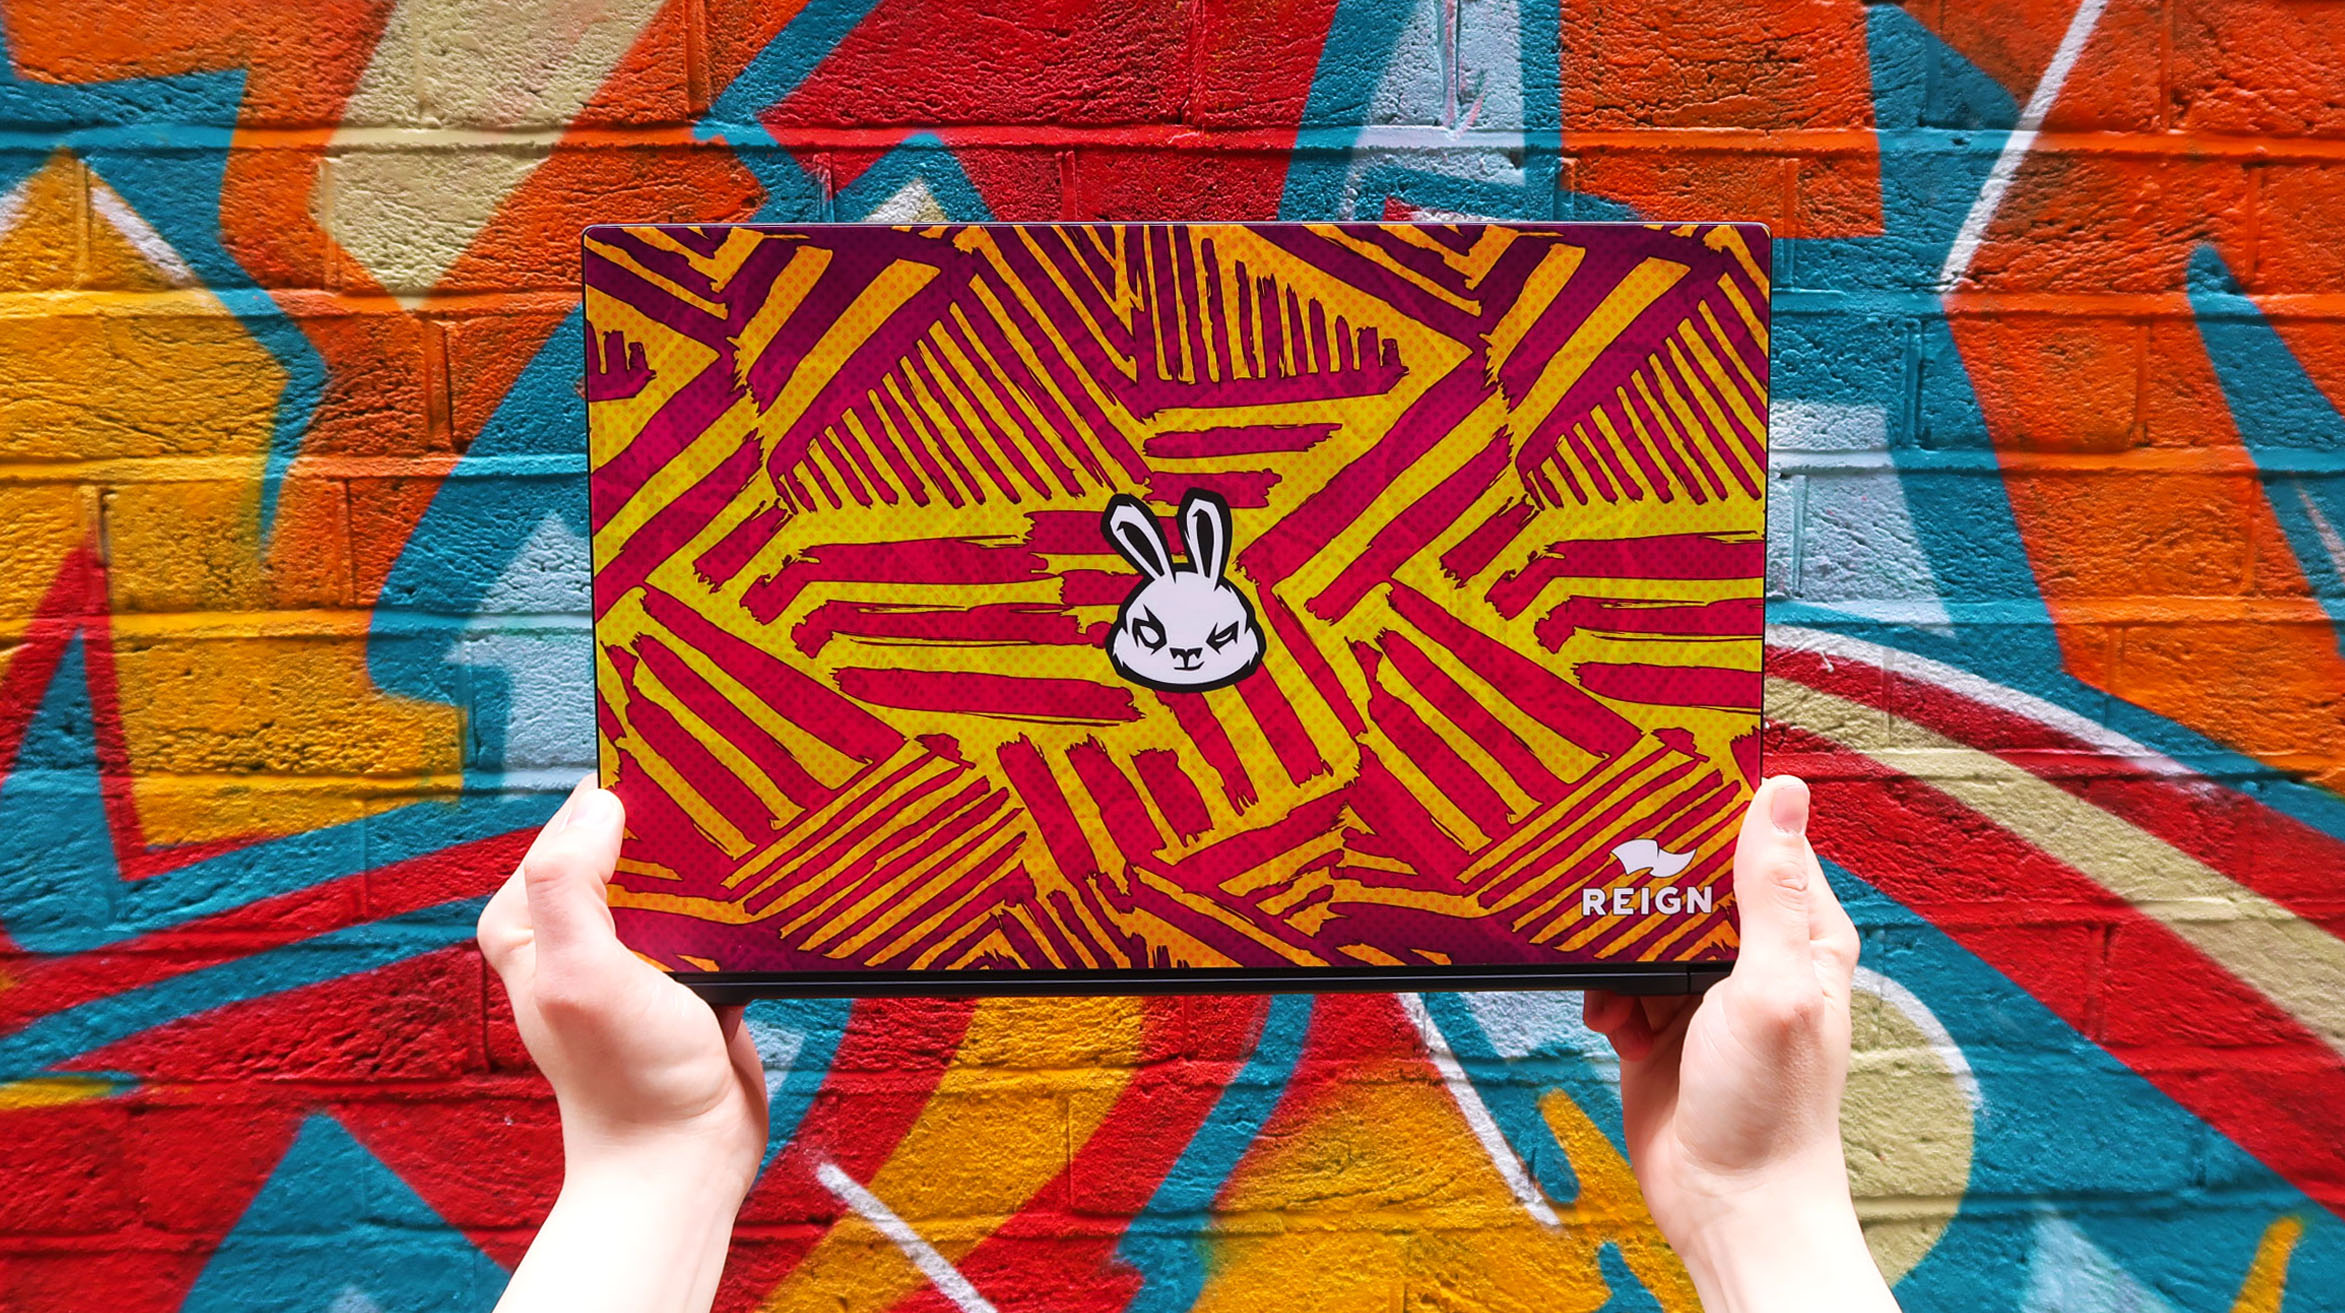 Sneak x Reign Bespoke Custom Gaming Laptop